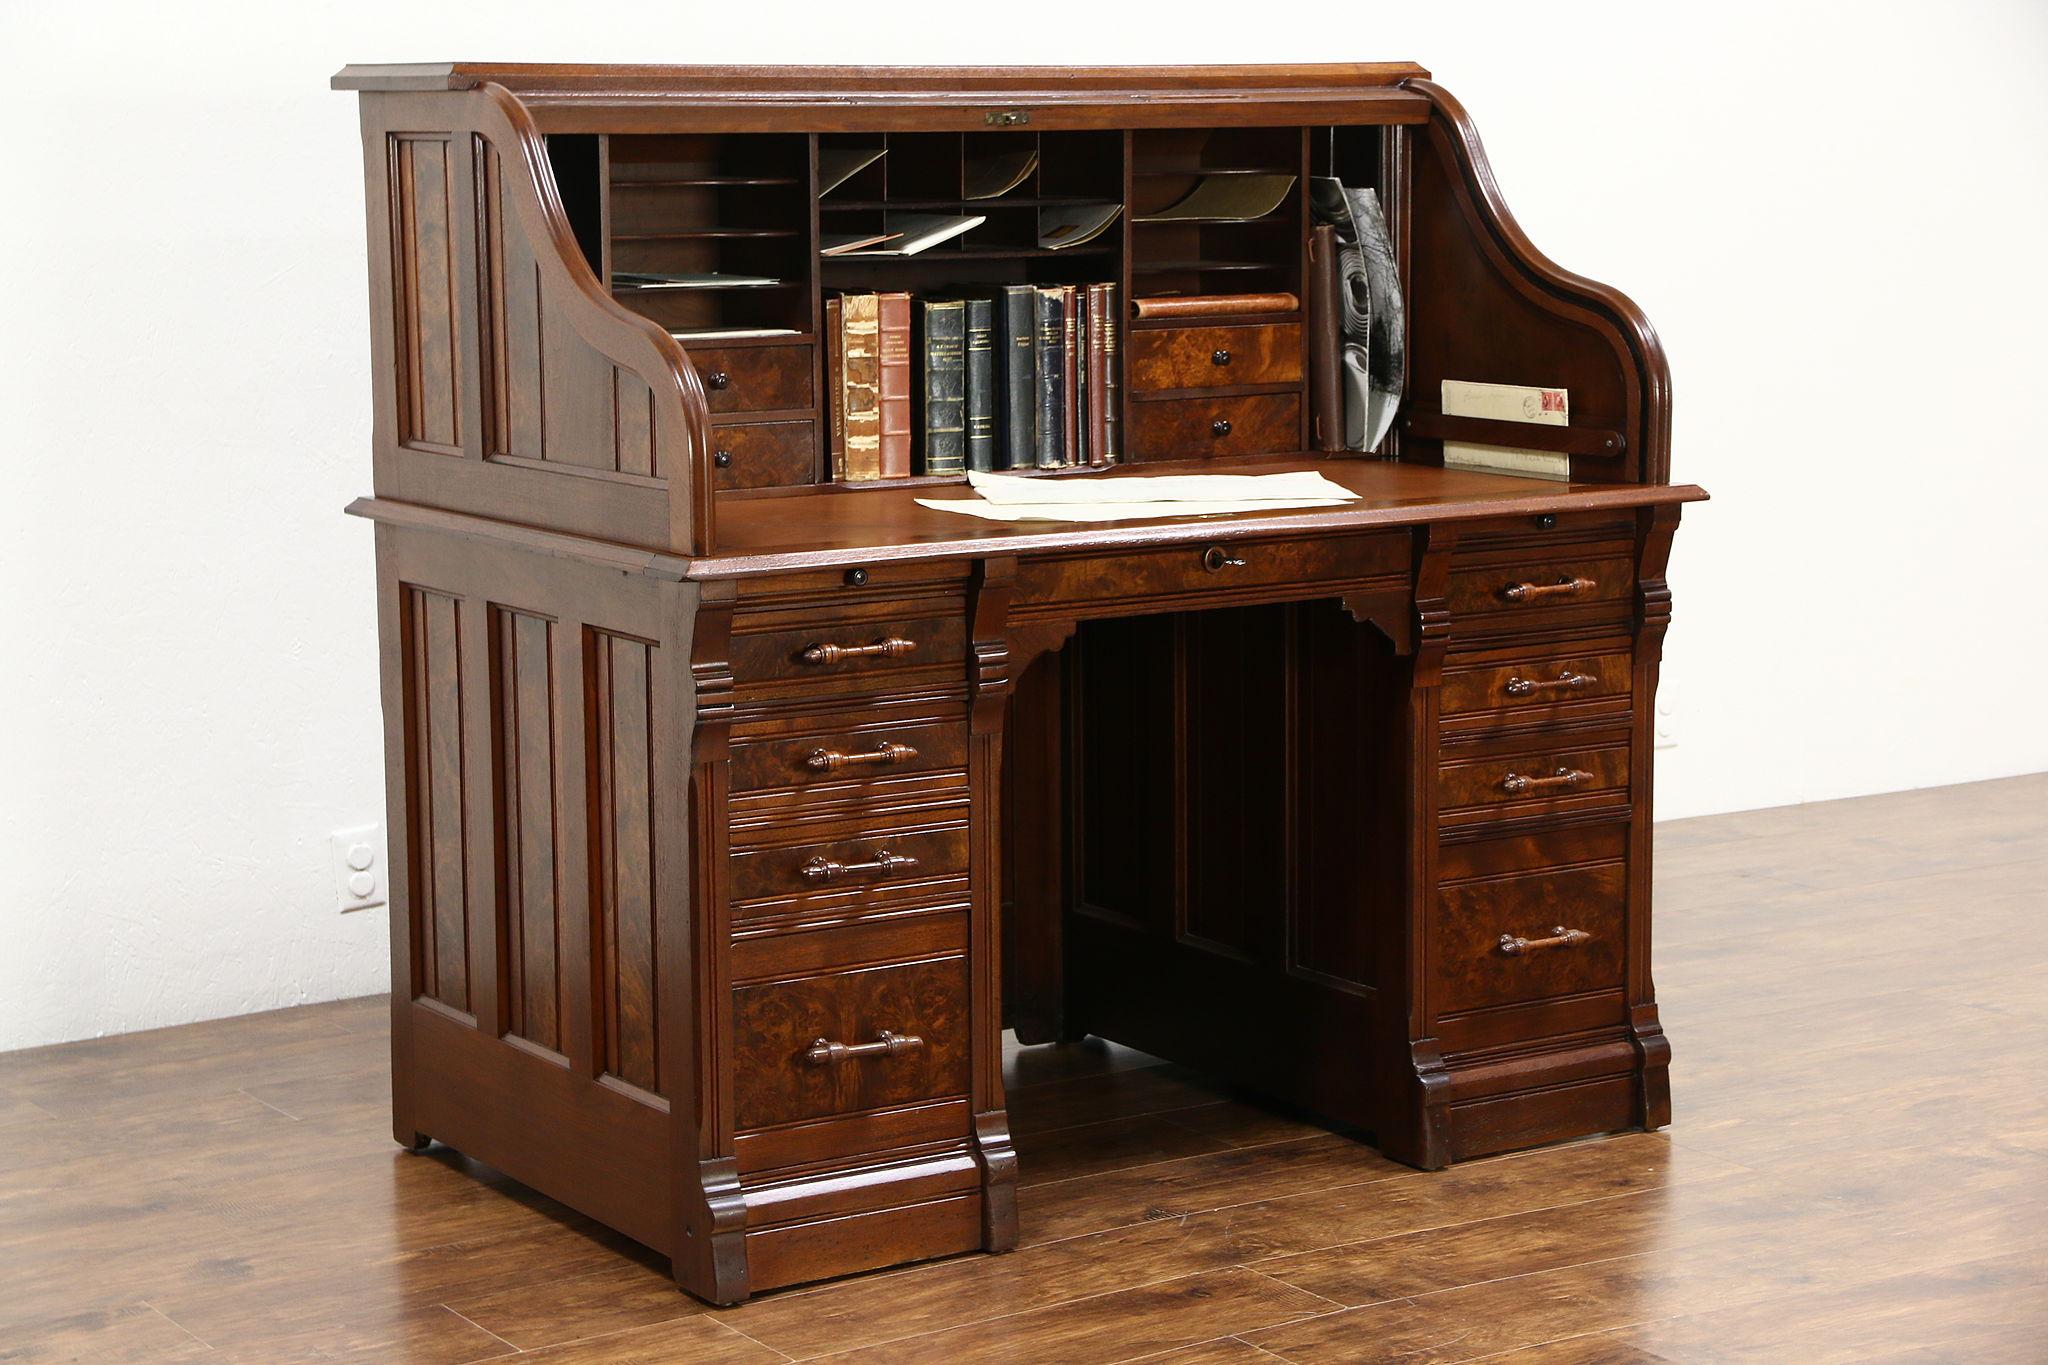 Victorian 1885 Antique Walnut Burl S Curve Roll Top Desk 55 Wide